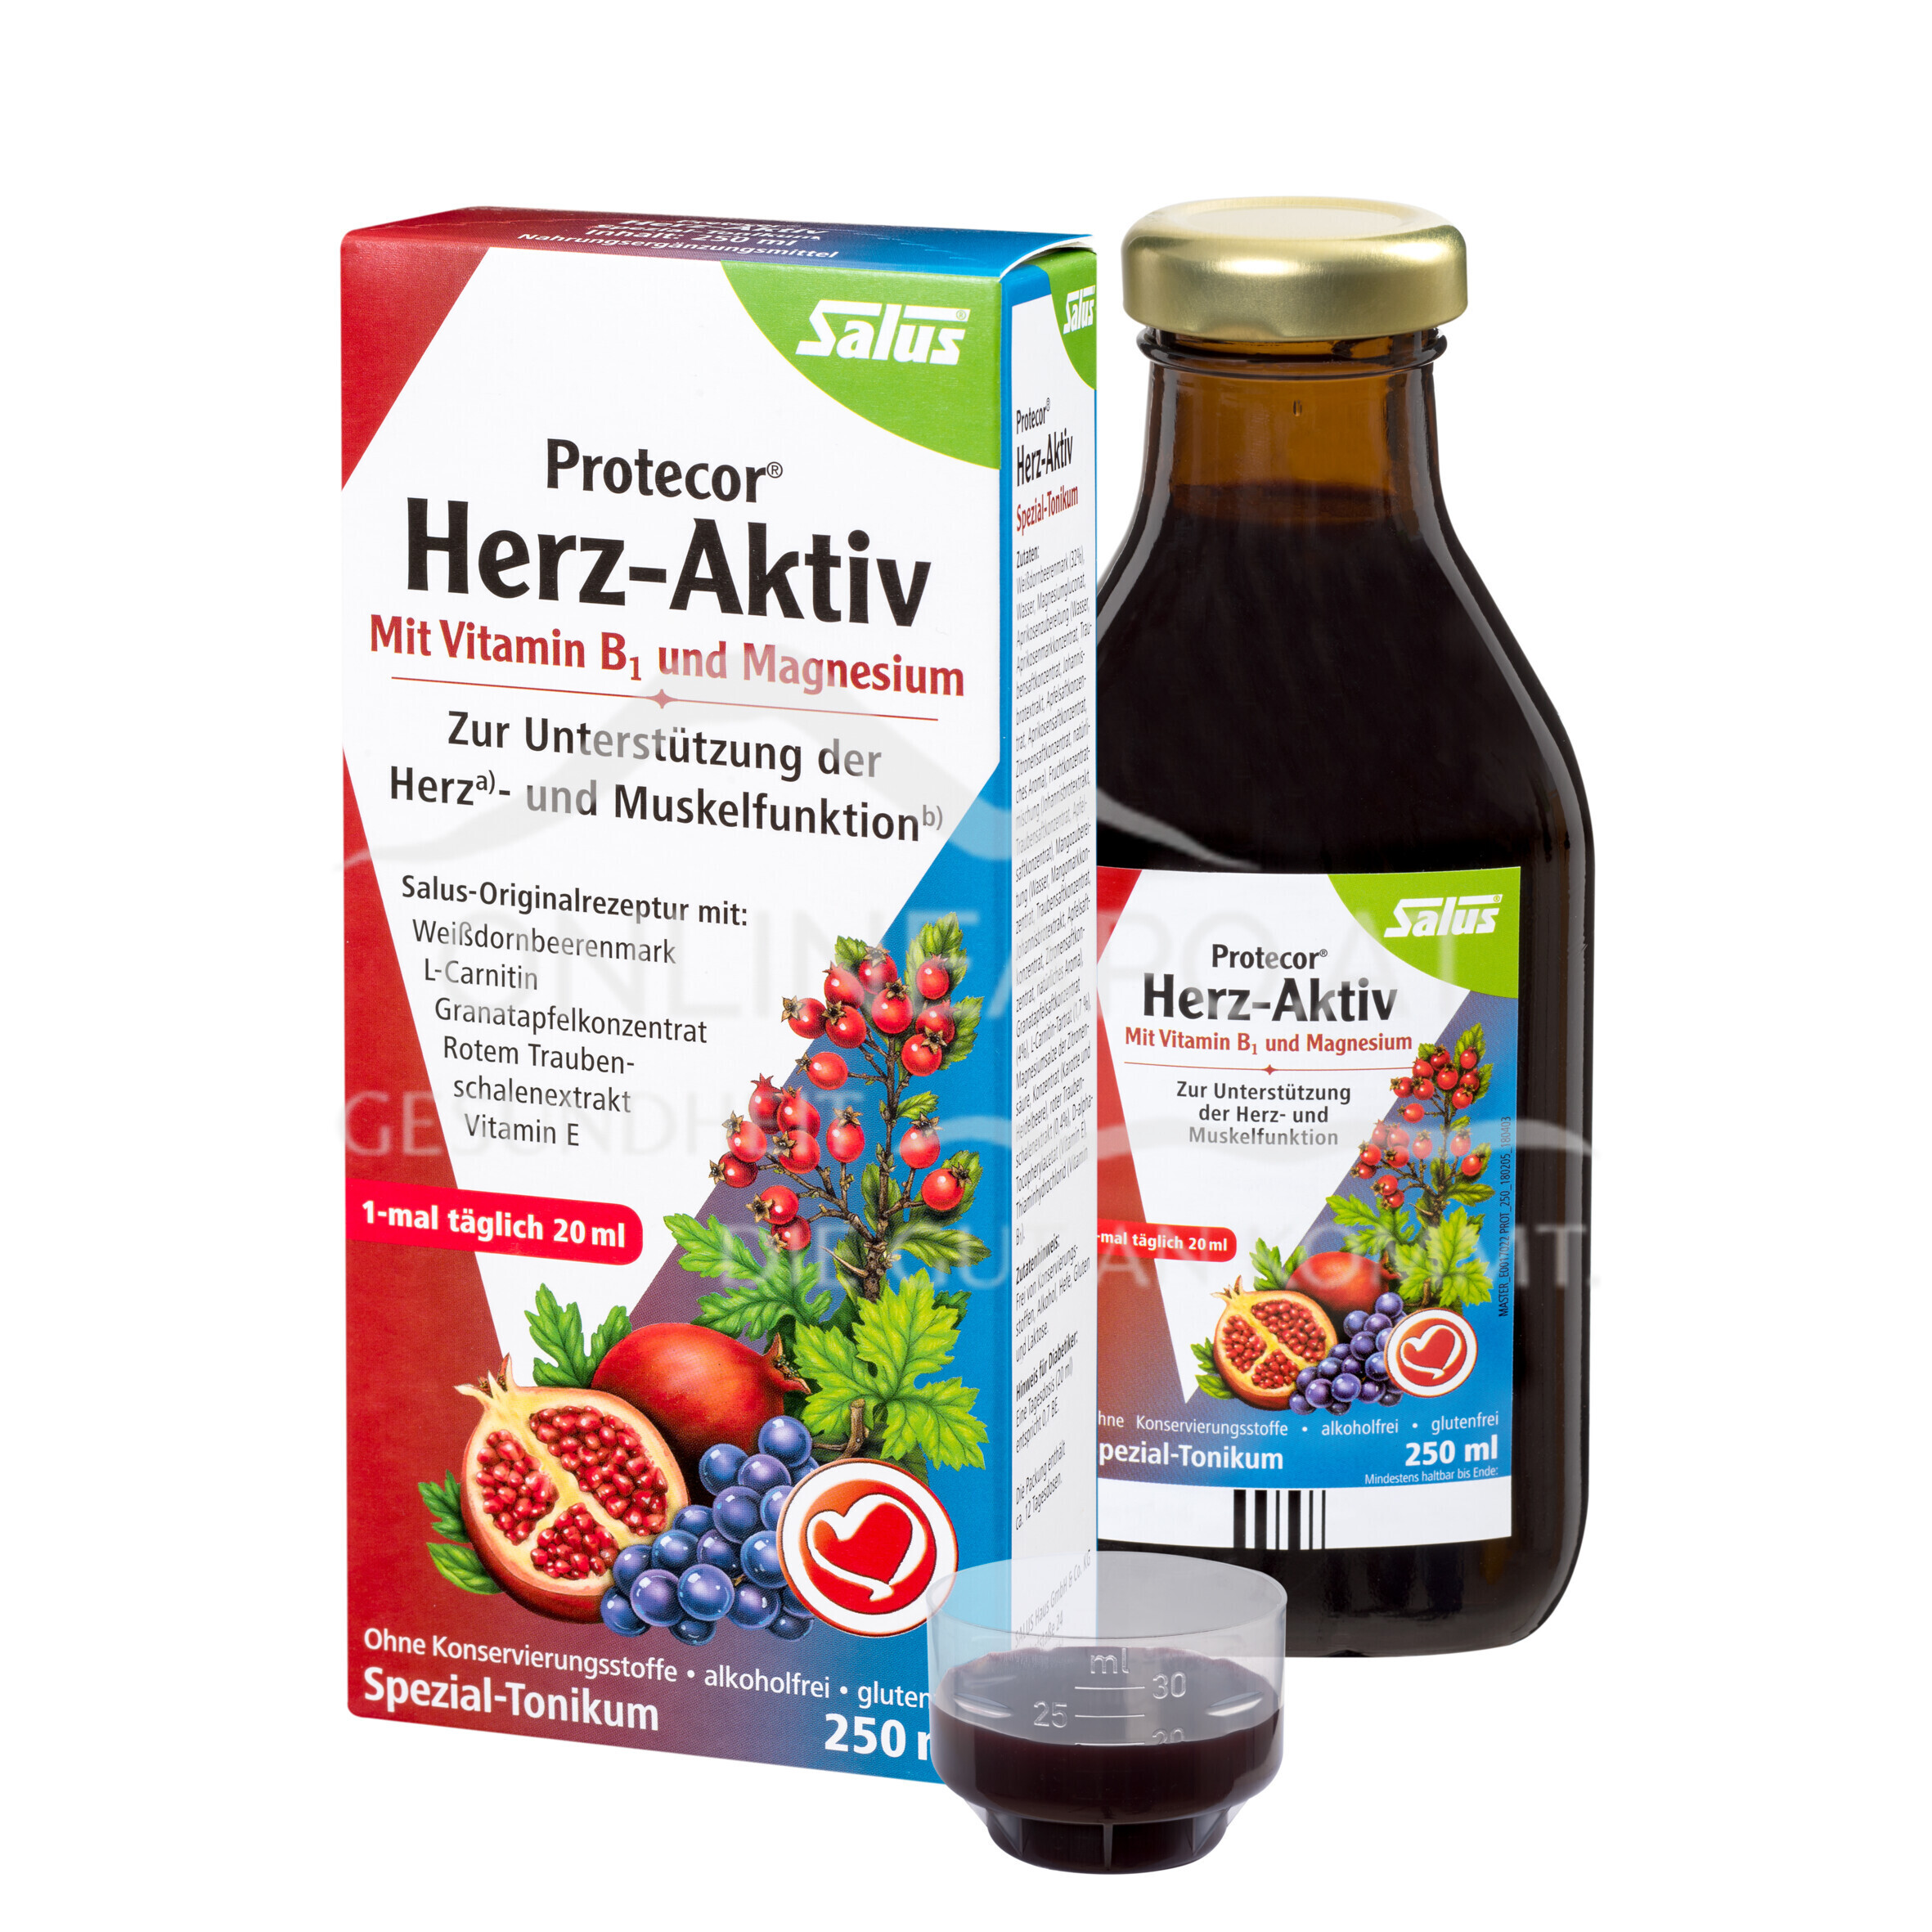 Salus® Protecor® Herz-Aktiv Tonikum